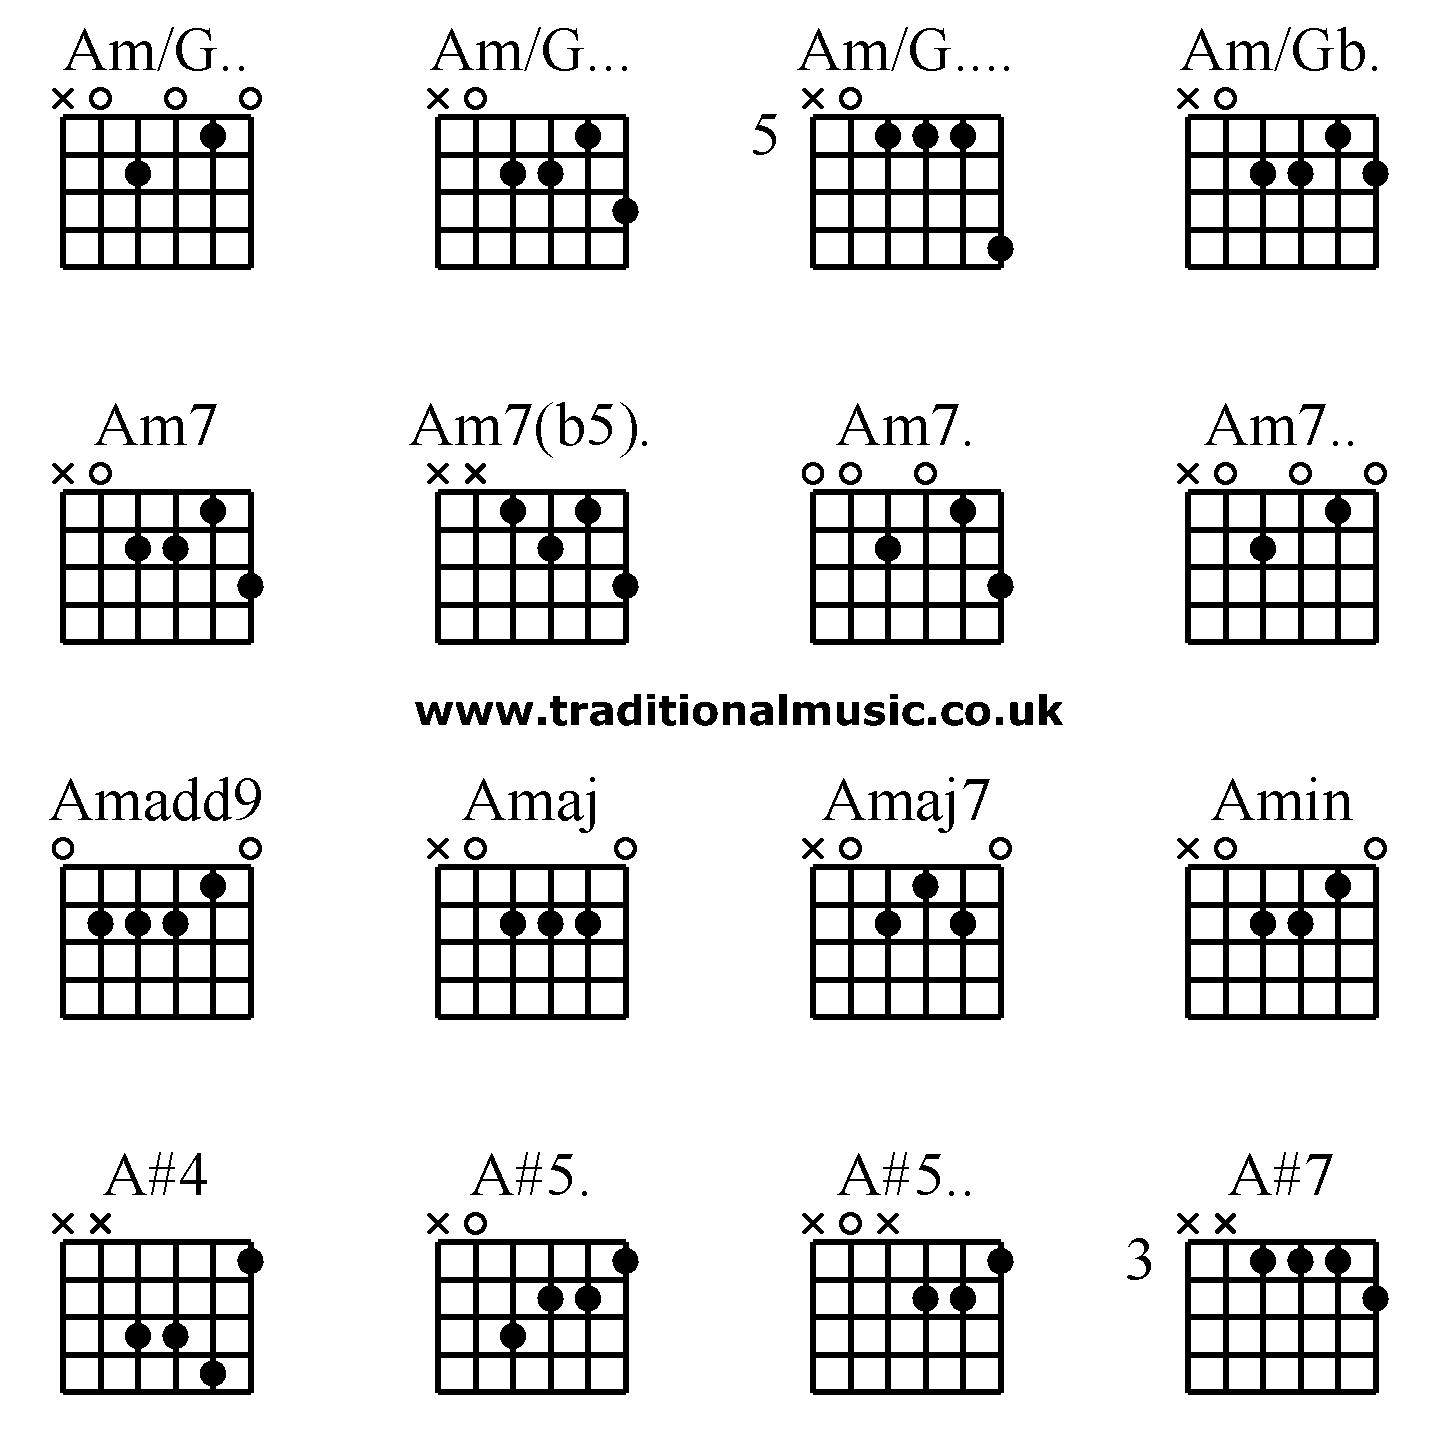 Guitar Chords On Guitar: Am/G. Am/G. Am/G. Am/Gb. Am7 Am7